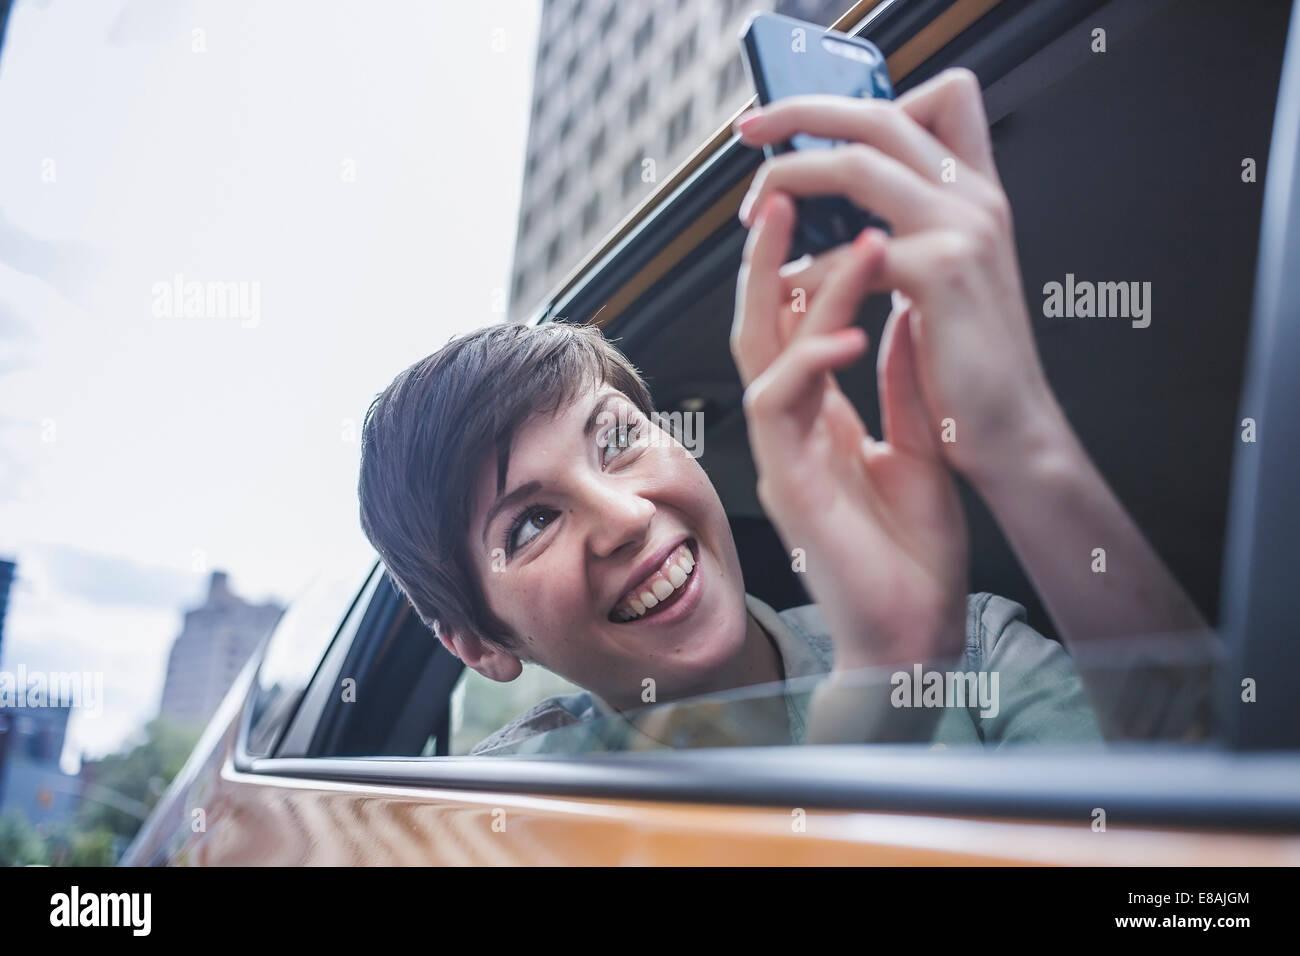 Frau fotografieren aus gelbes Taxi, New York, USA Stockbild